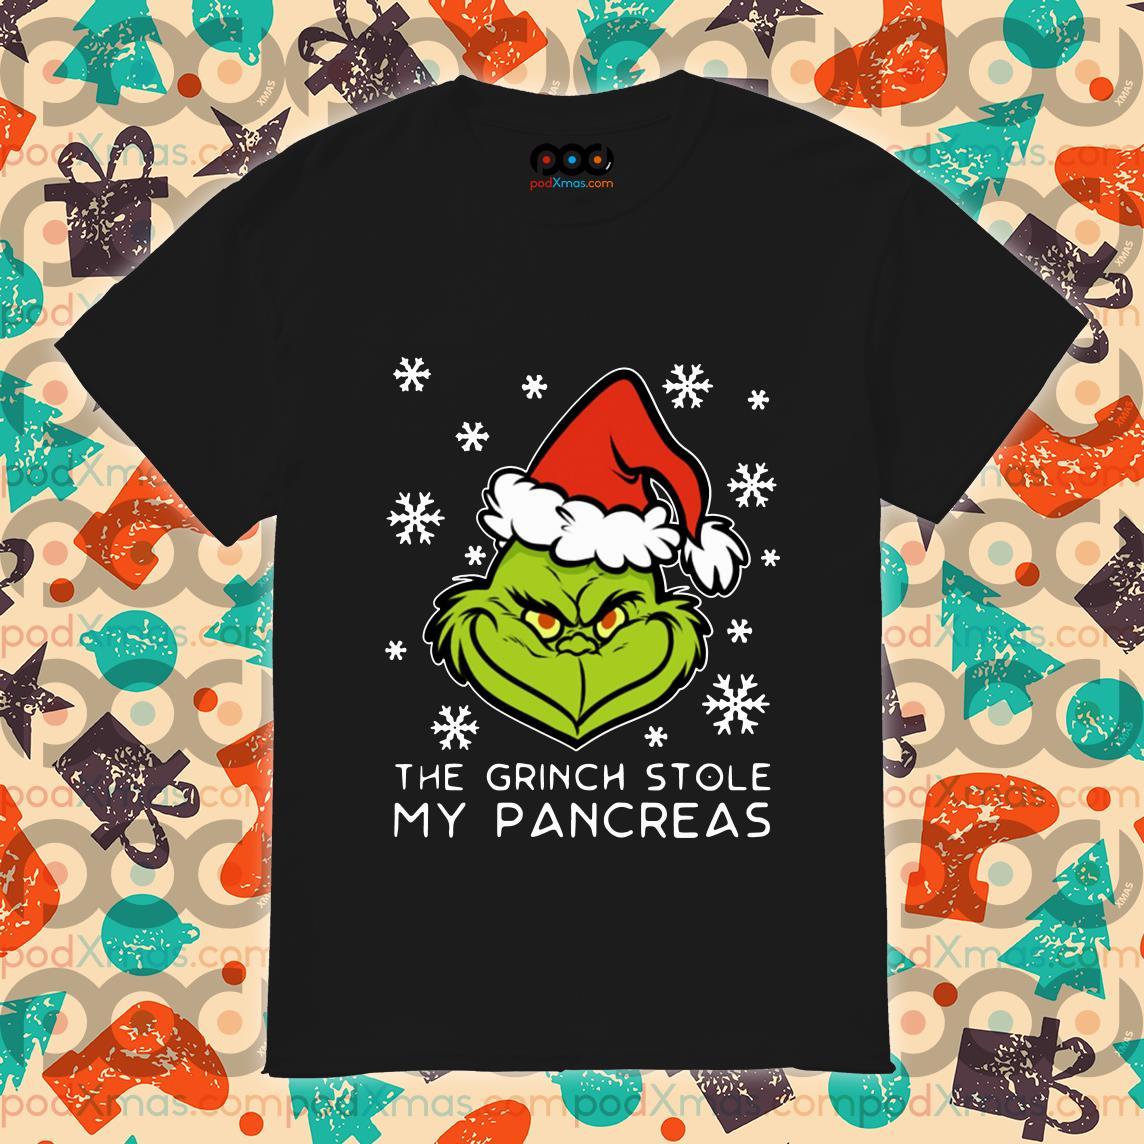 The Grinch Stole my pancreas shirt